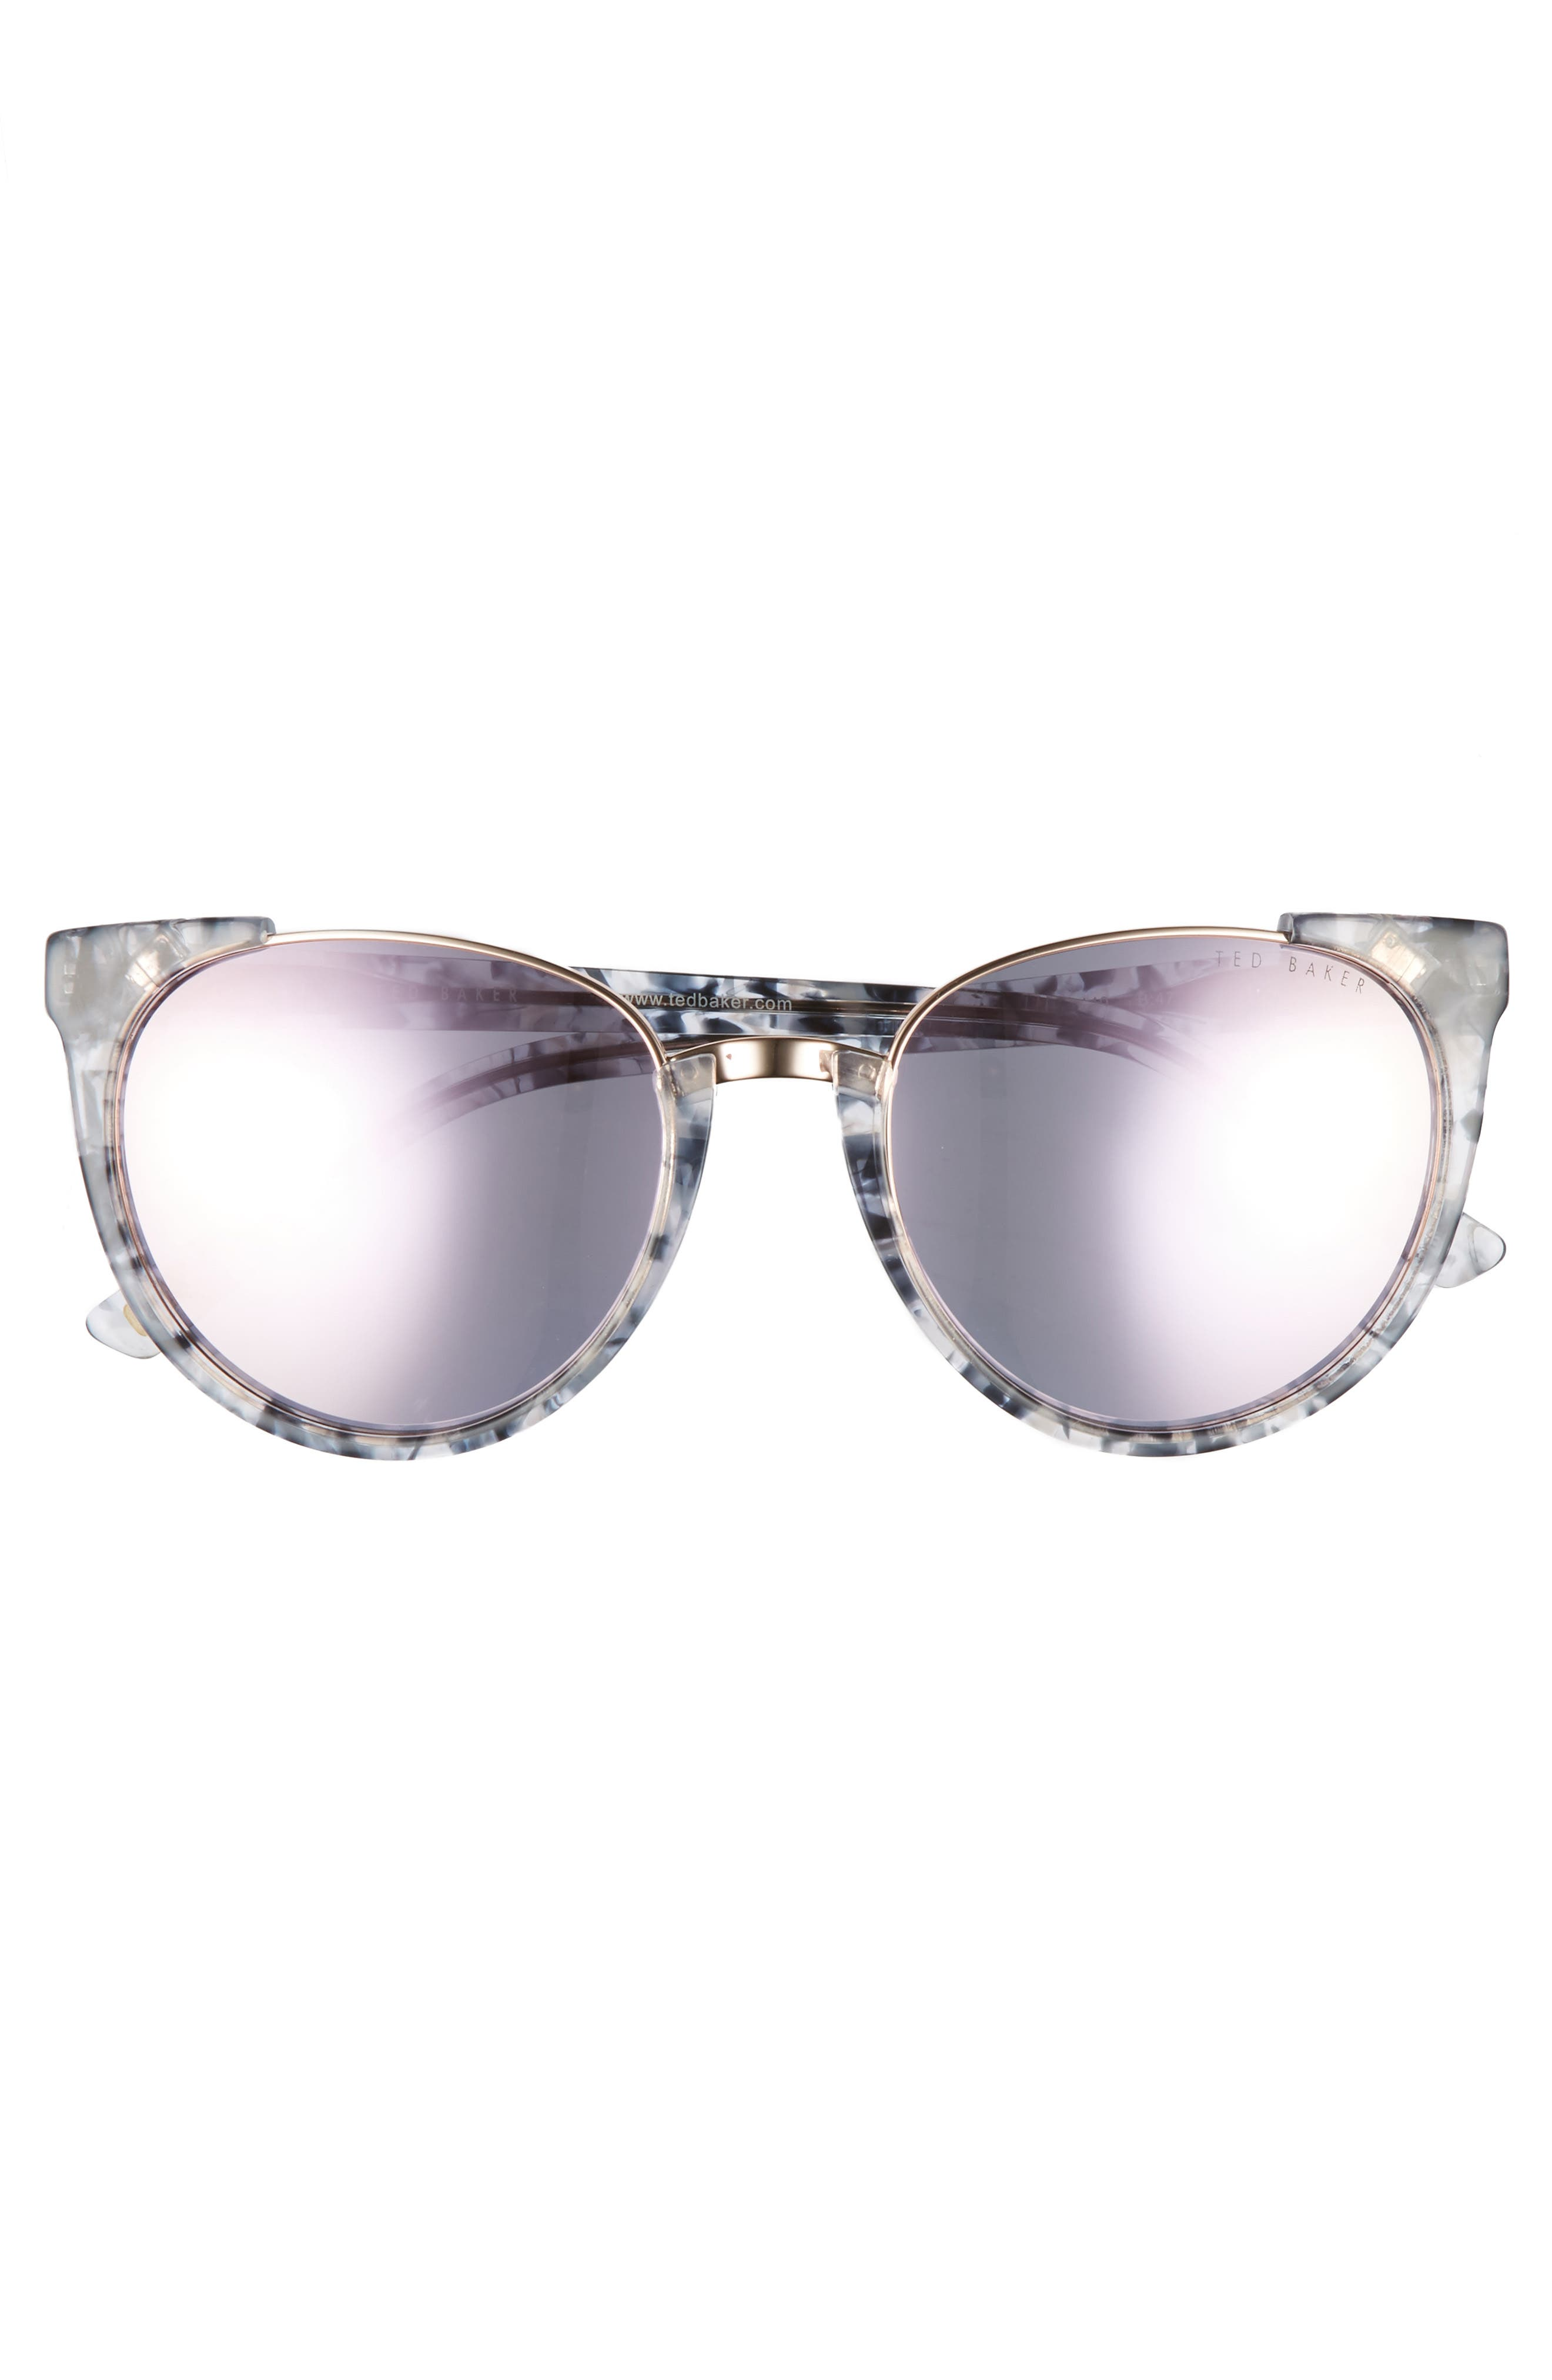 53mm Modified Oval Sunglasses,                             Alternate thumbnail 3, color,                             Blue